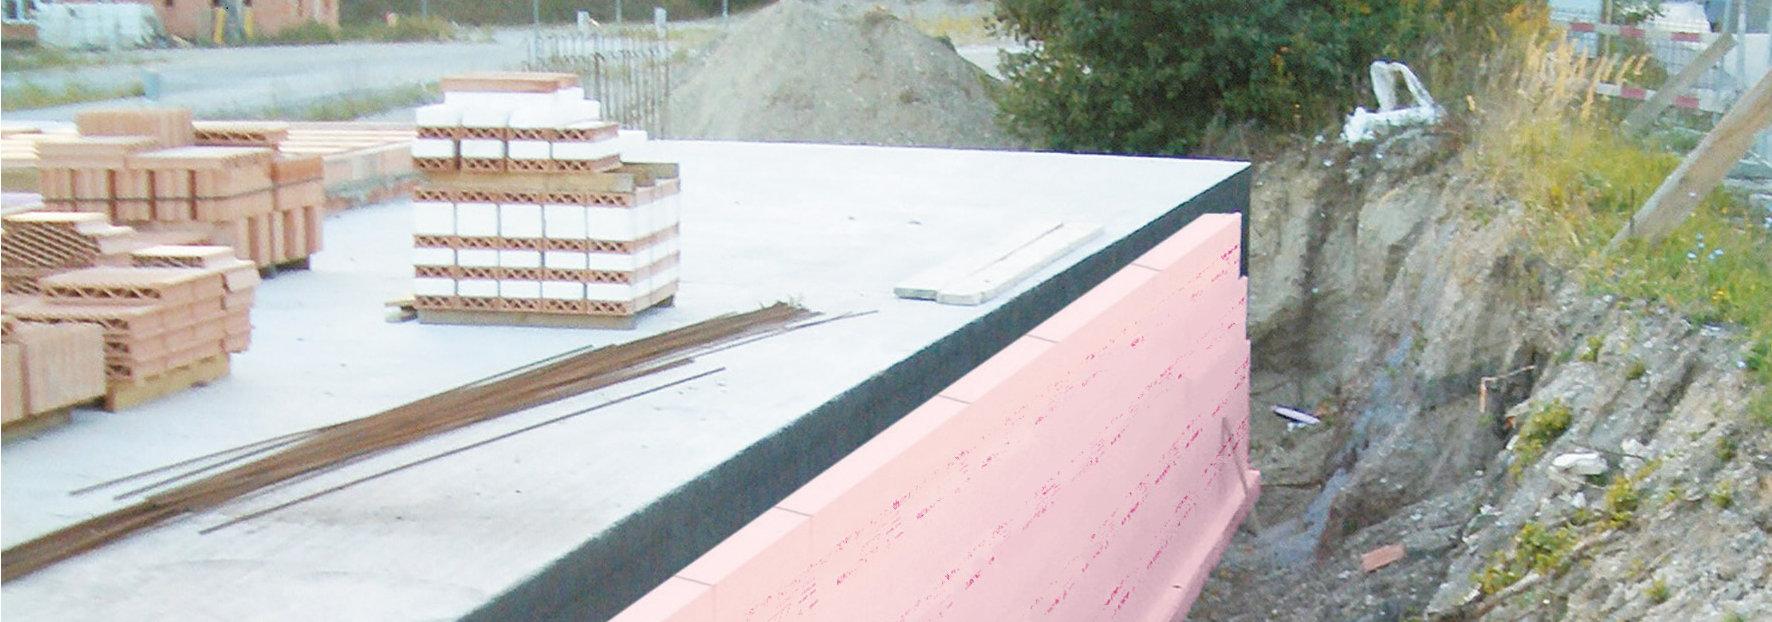 Austrotherm perimeter insulation